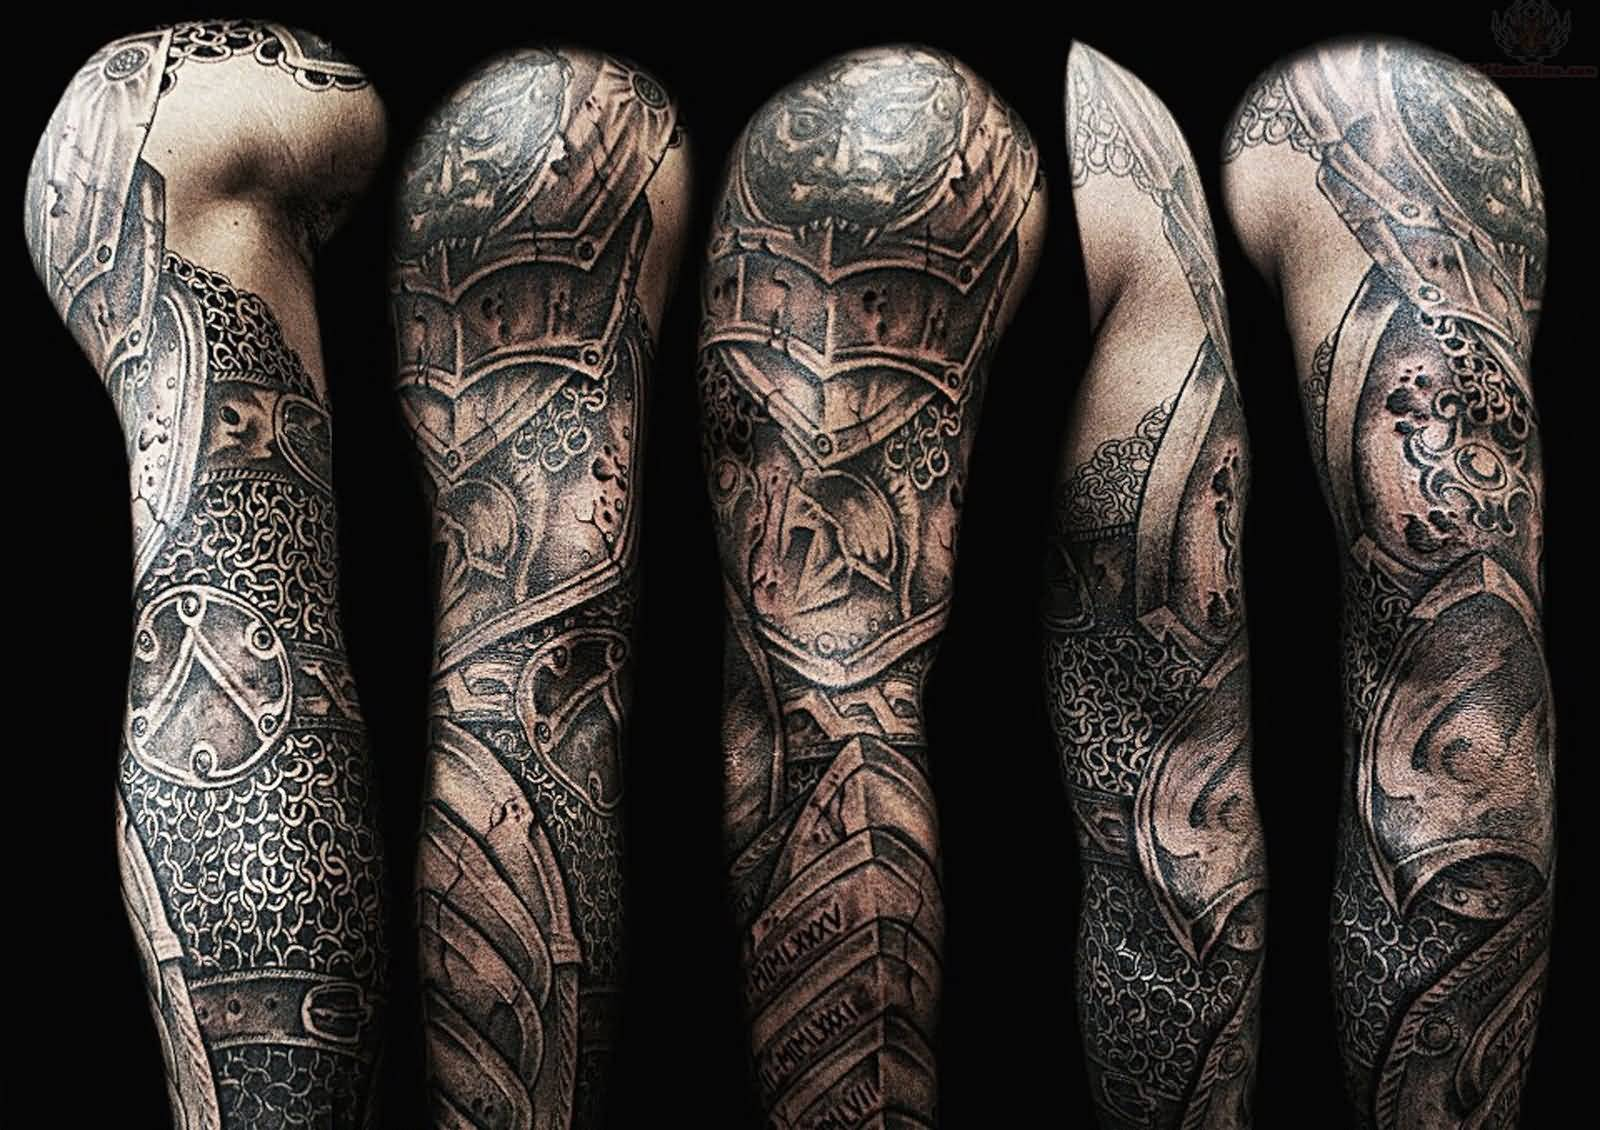 e9eebcf5d Grey Ink Armor Tattoo On Full Sleeve